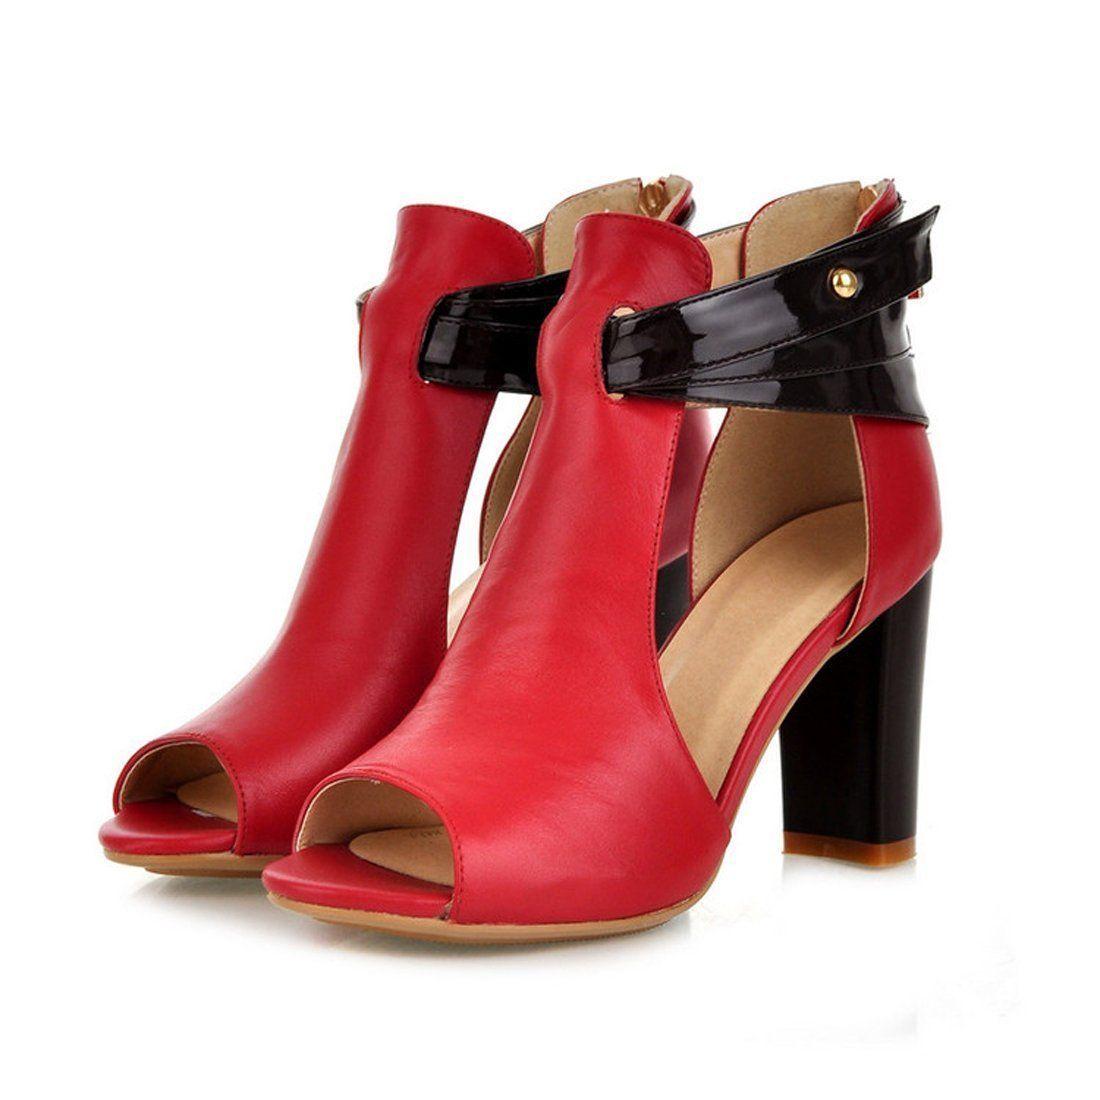 Amazon.com | Milesline Women's Peep Toe Open Side Bootie Fashion High Heel Sandals | Shoes